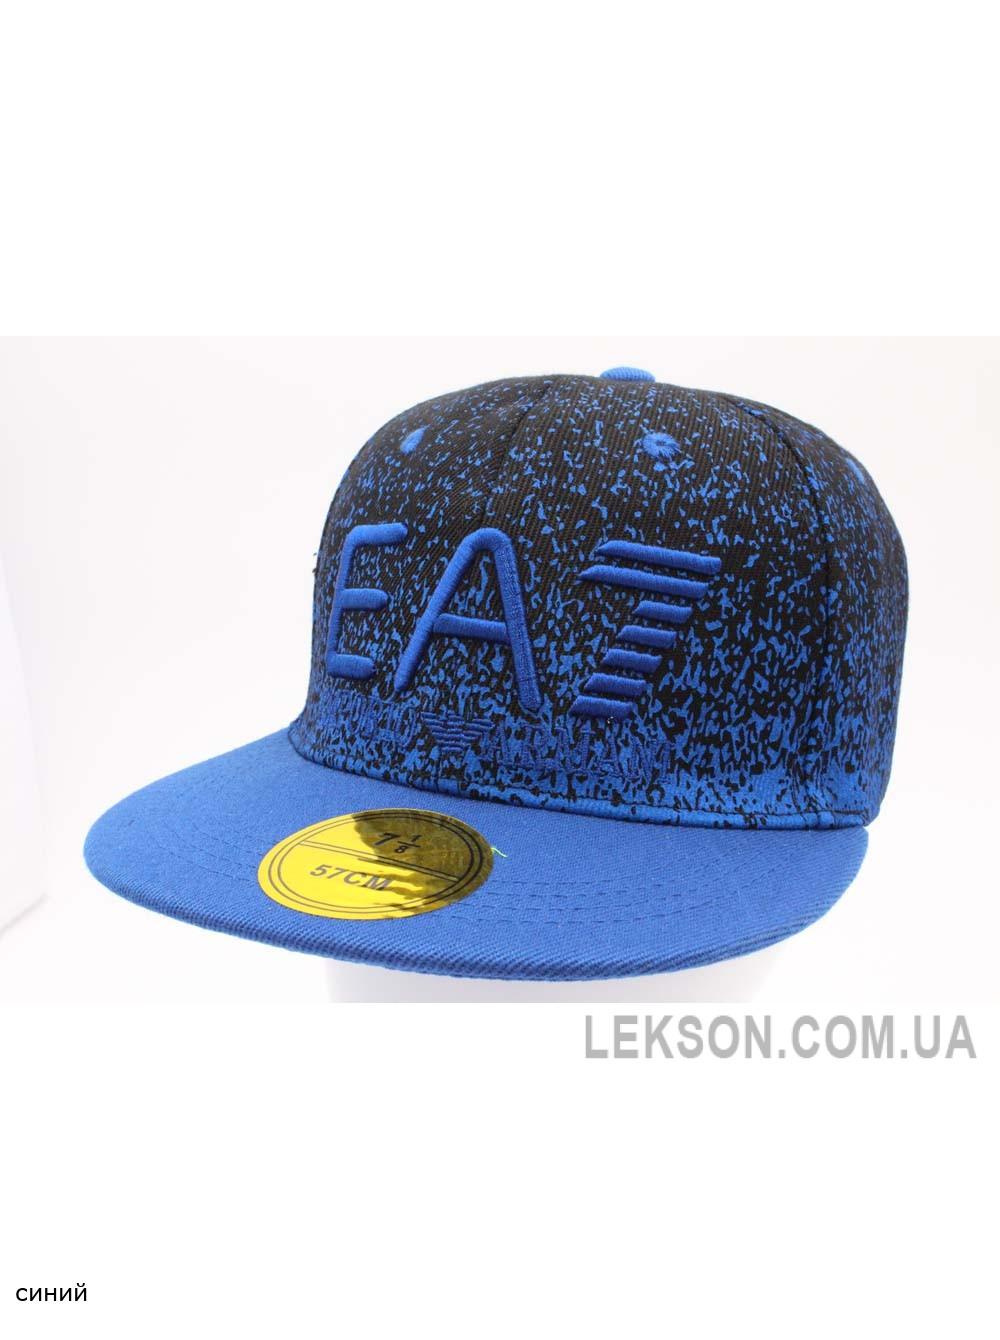 Rap - cc08022-57